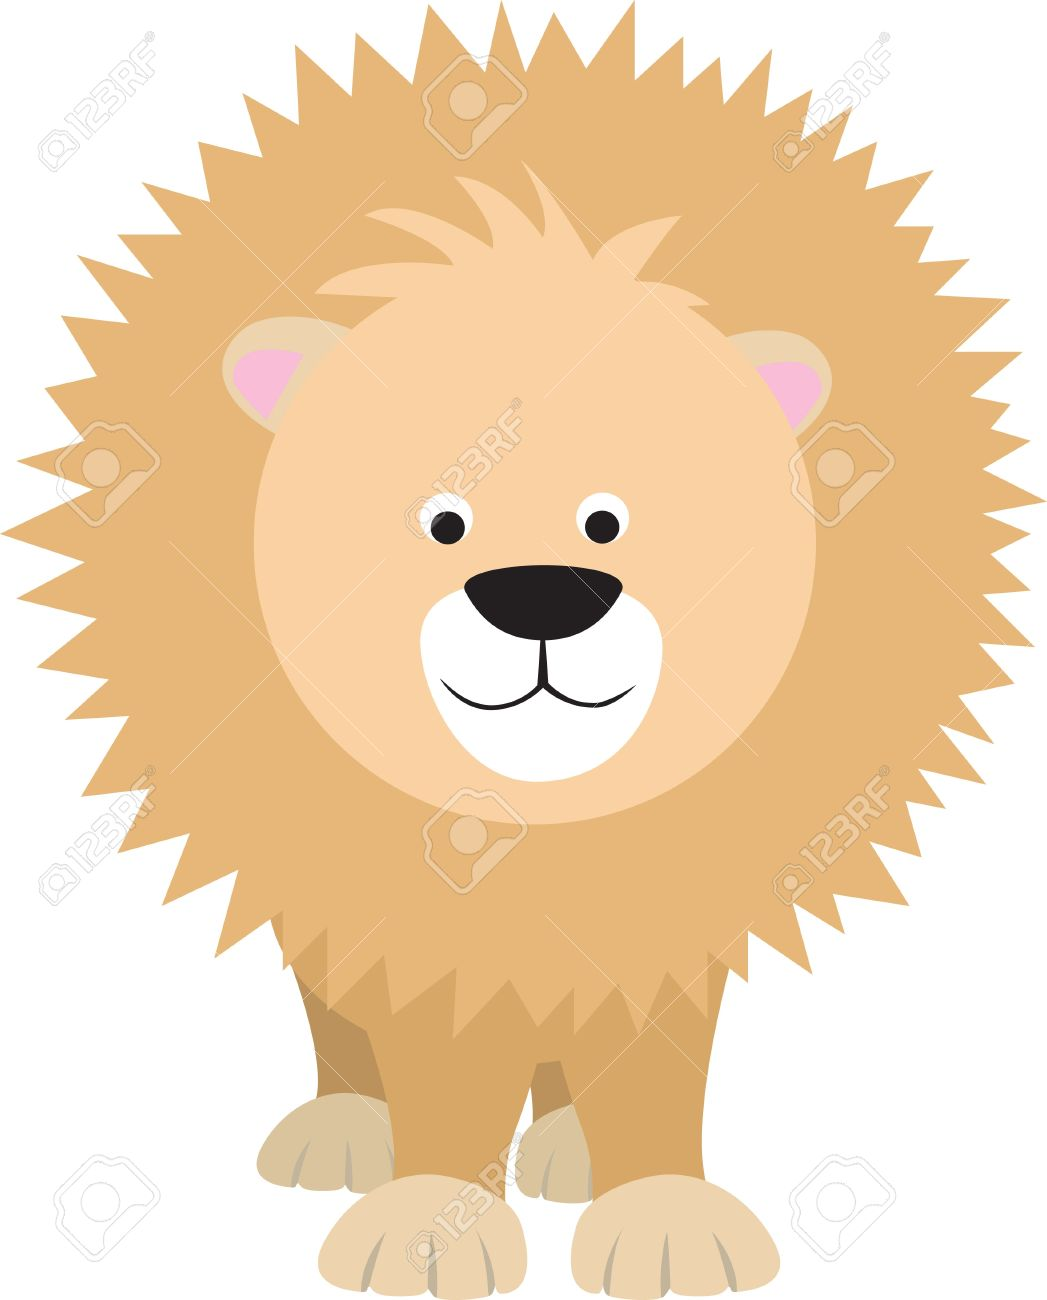 Personaje De Dibujos Animados De Color Moderna De León Sobre Fondo